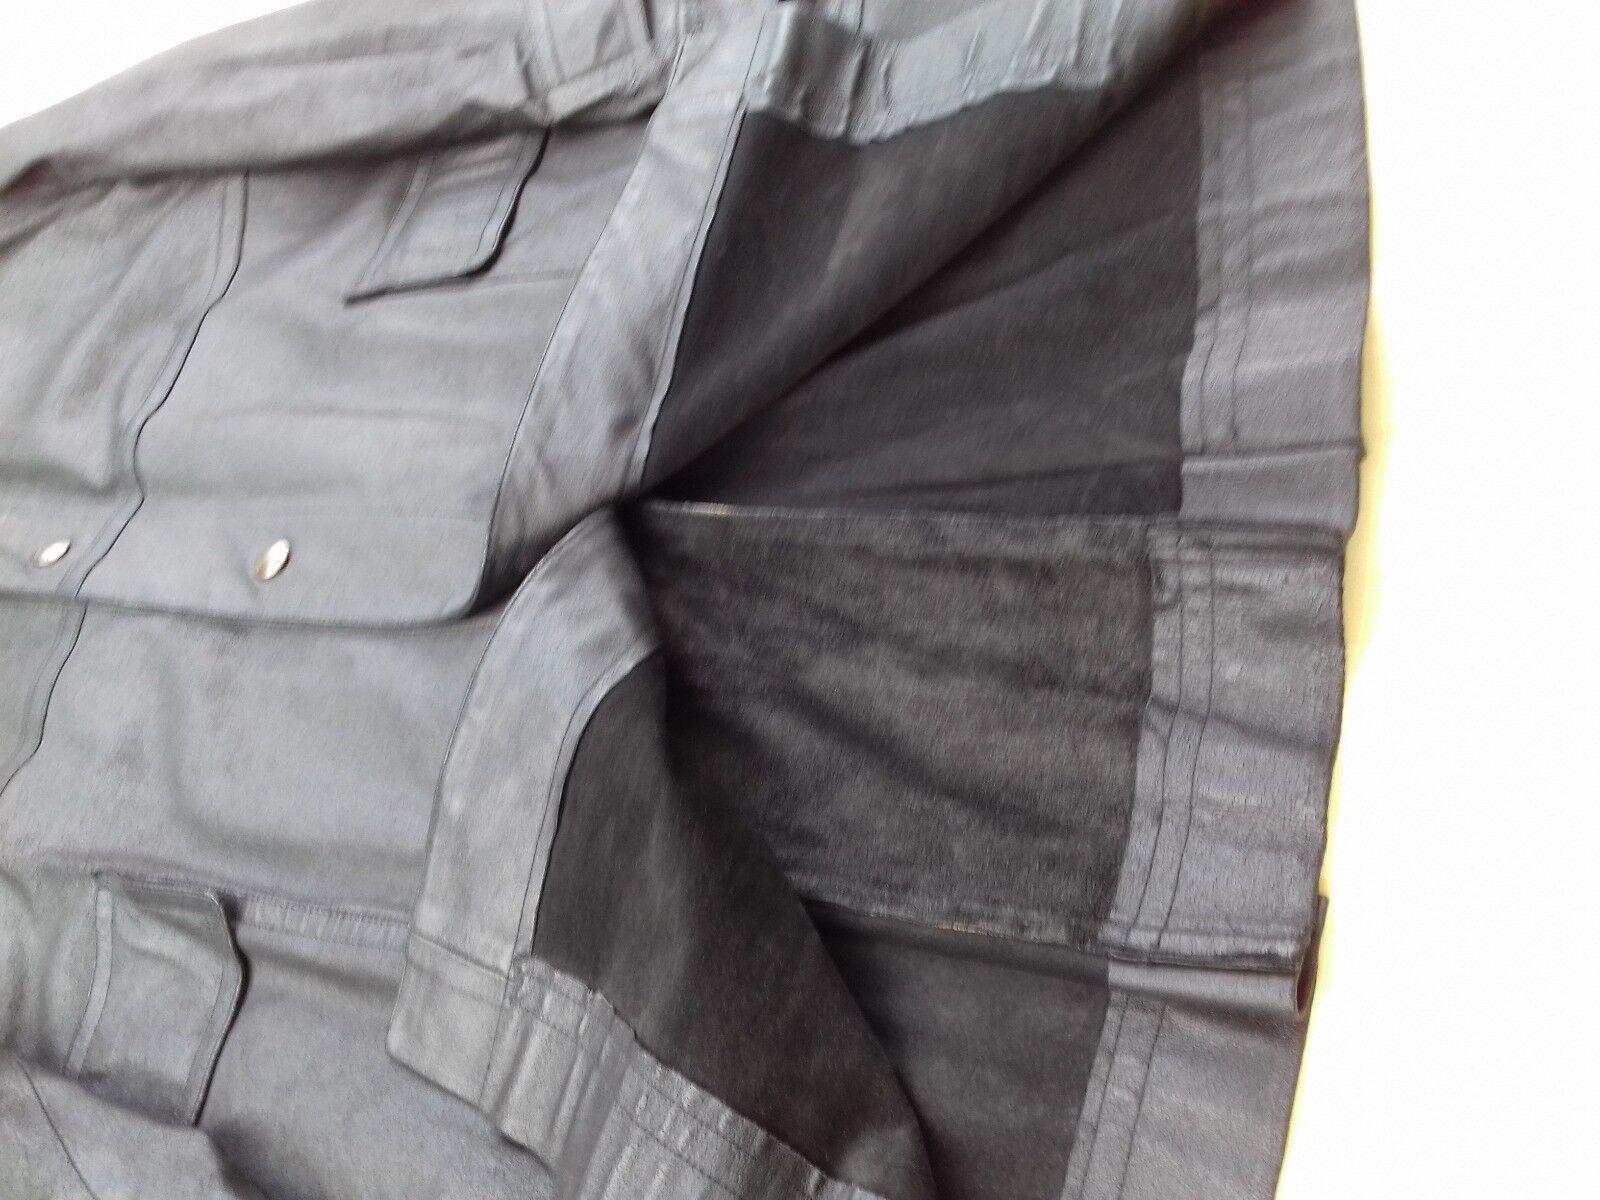 Manteau  hermes cuir taille 52